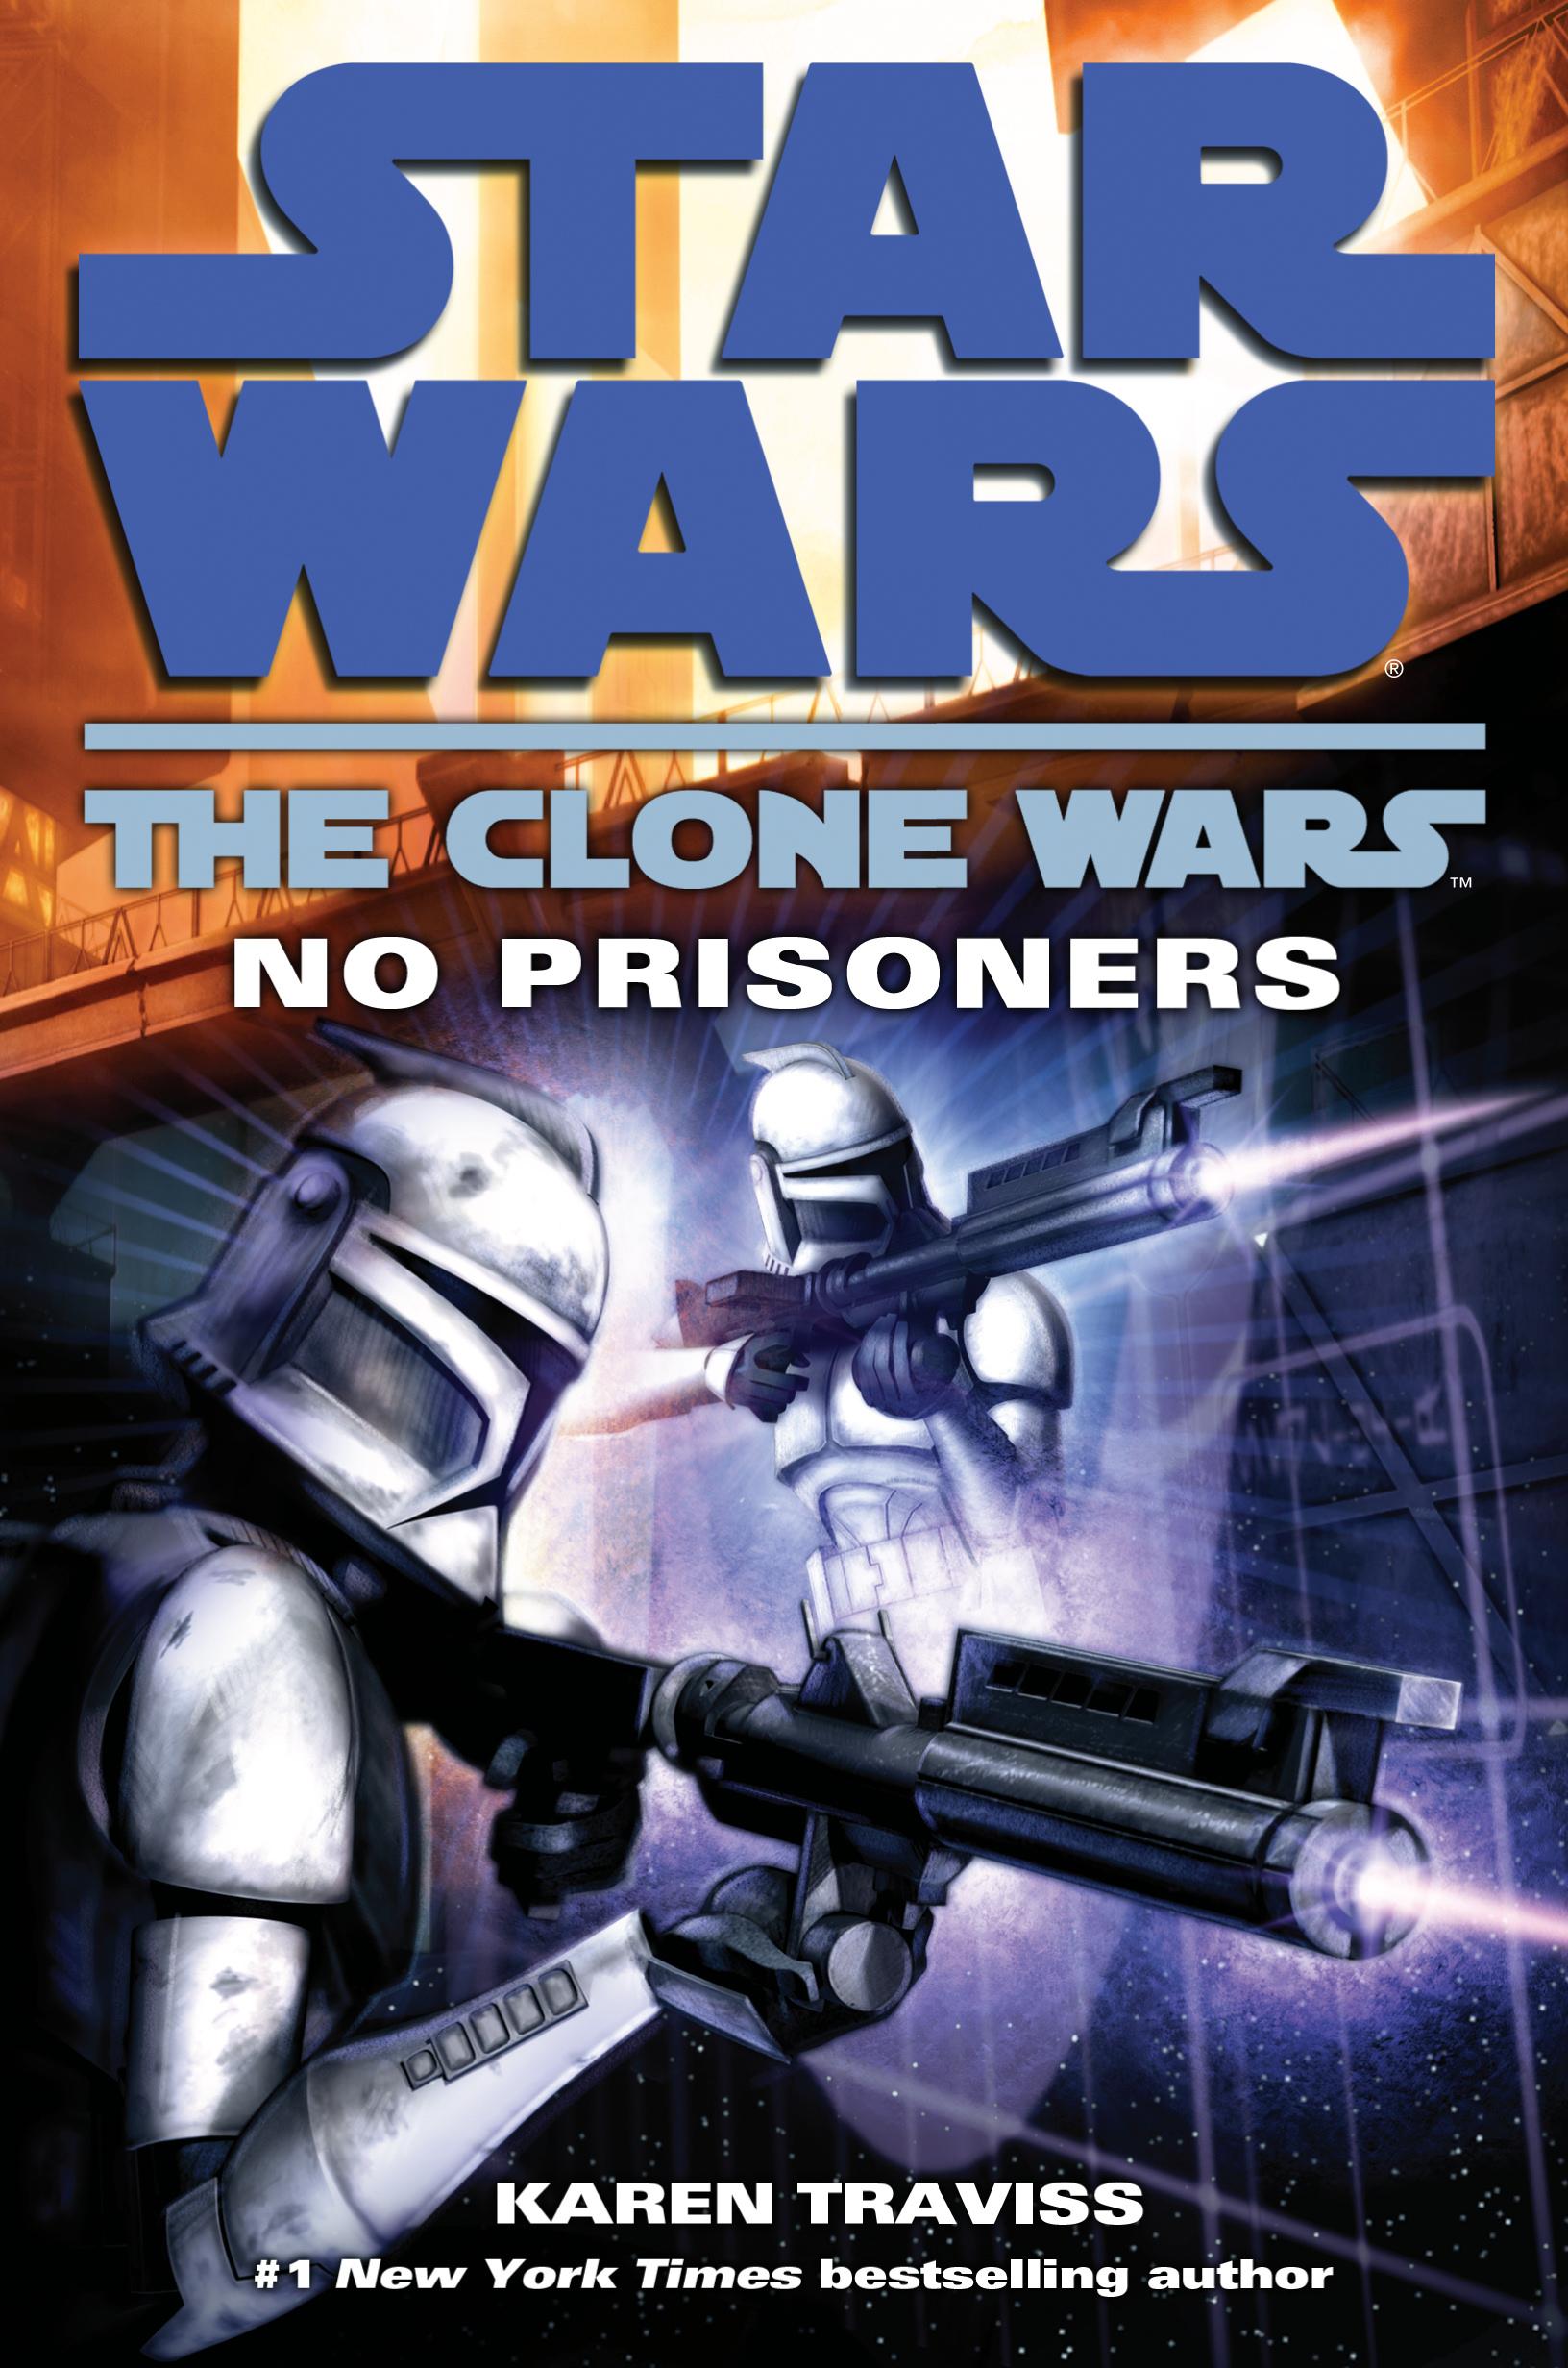 Star Wars The Clone Wars: No Prisoners